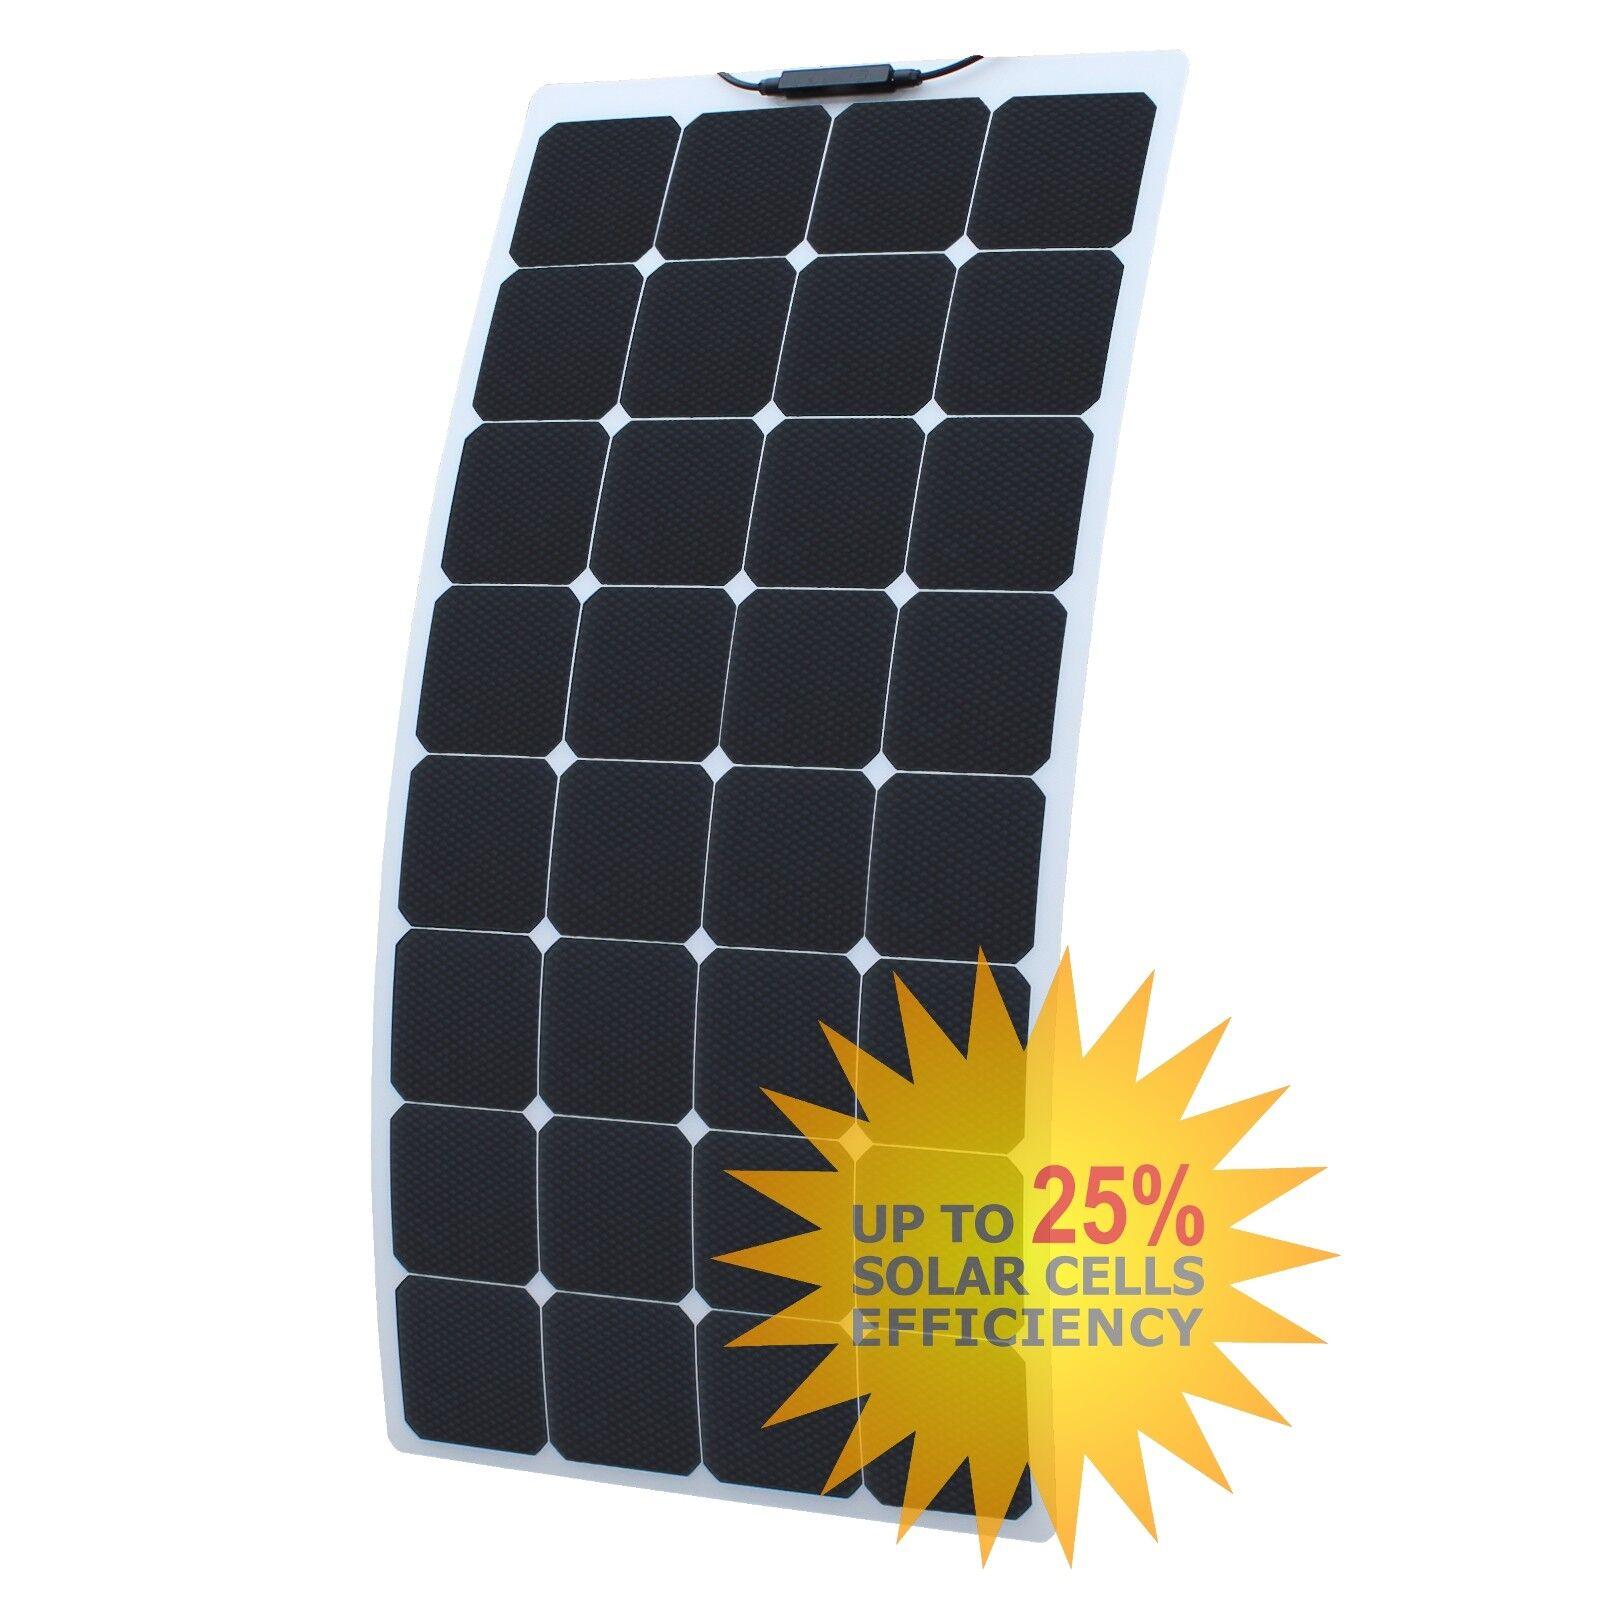 110W semi-flexible ETFE anti-reflective solar solar solar panel for boat campervan motorhome 65e74e